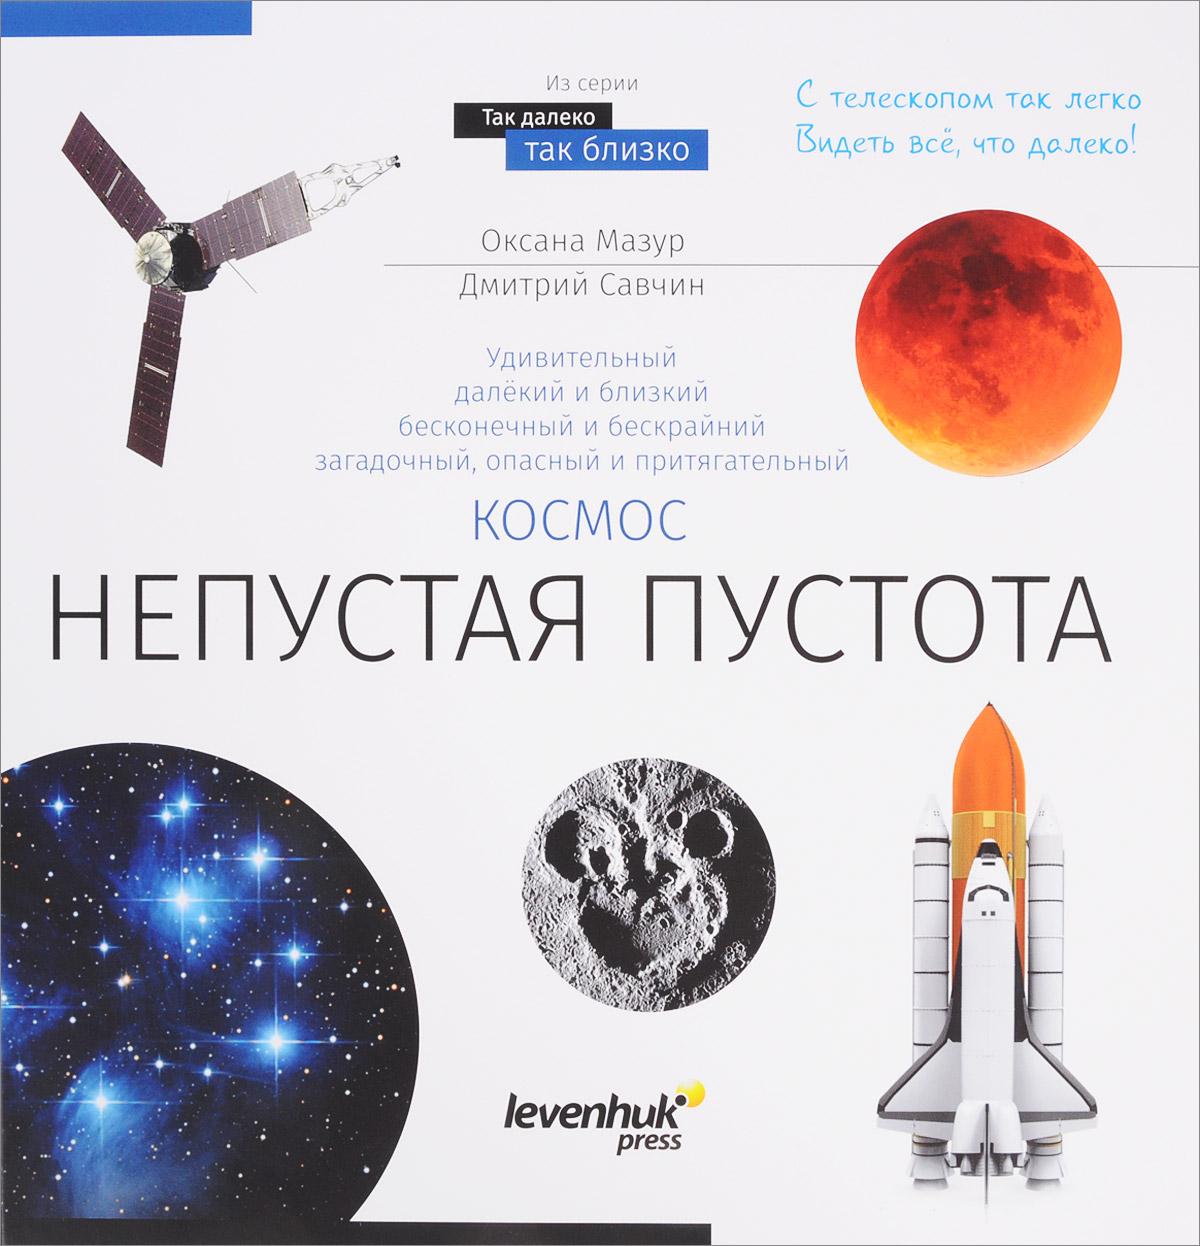 купить Оксана Мазур, Дмитрий Савчин Книга знаний